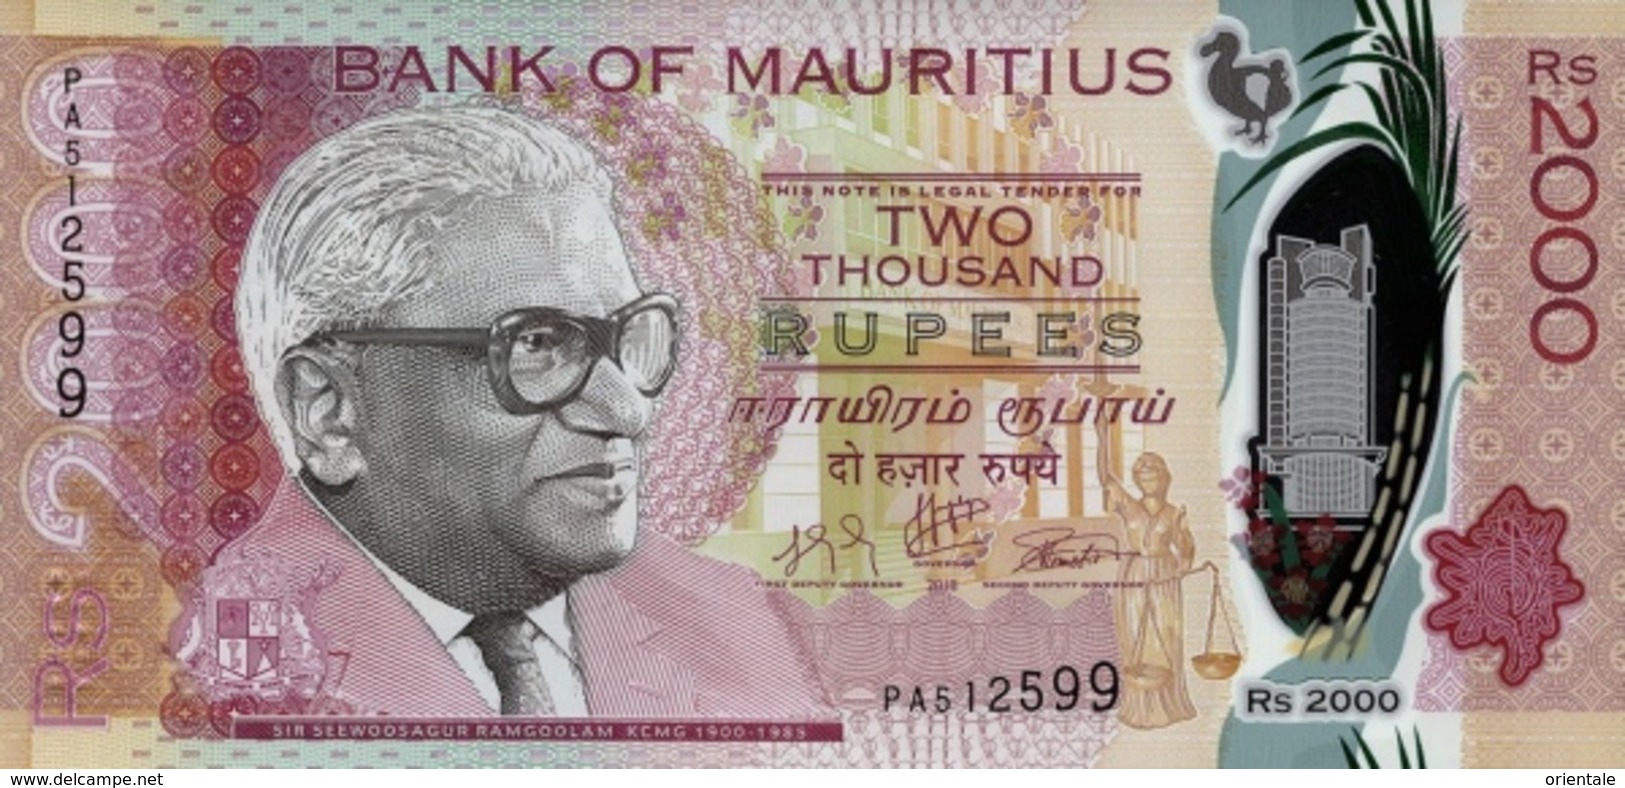 MAURITIUS P. NEW 2000 R 2018 UNC - Maurice